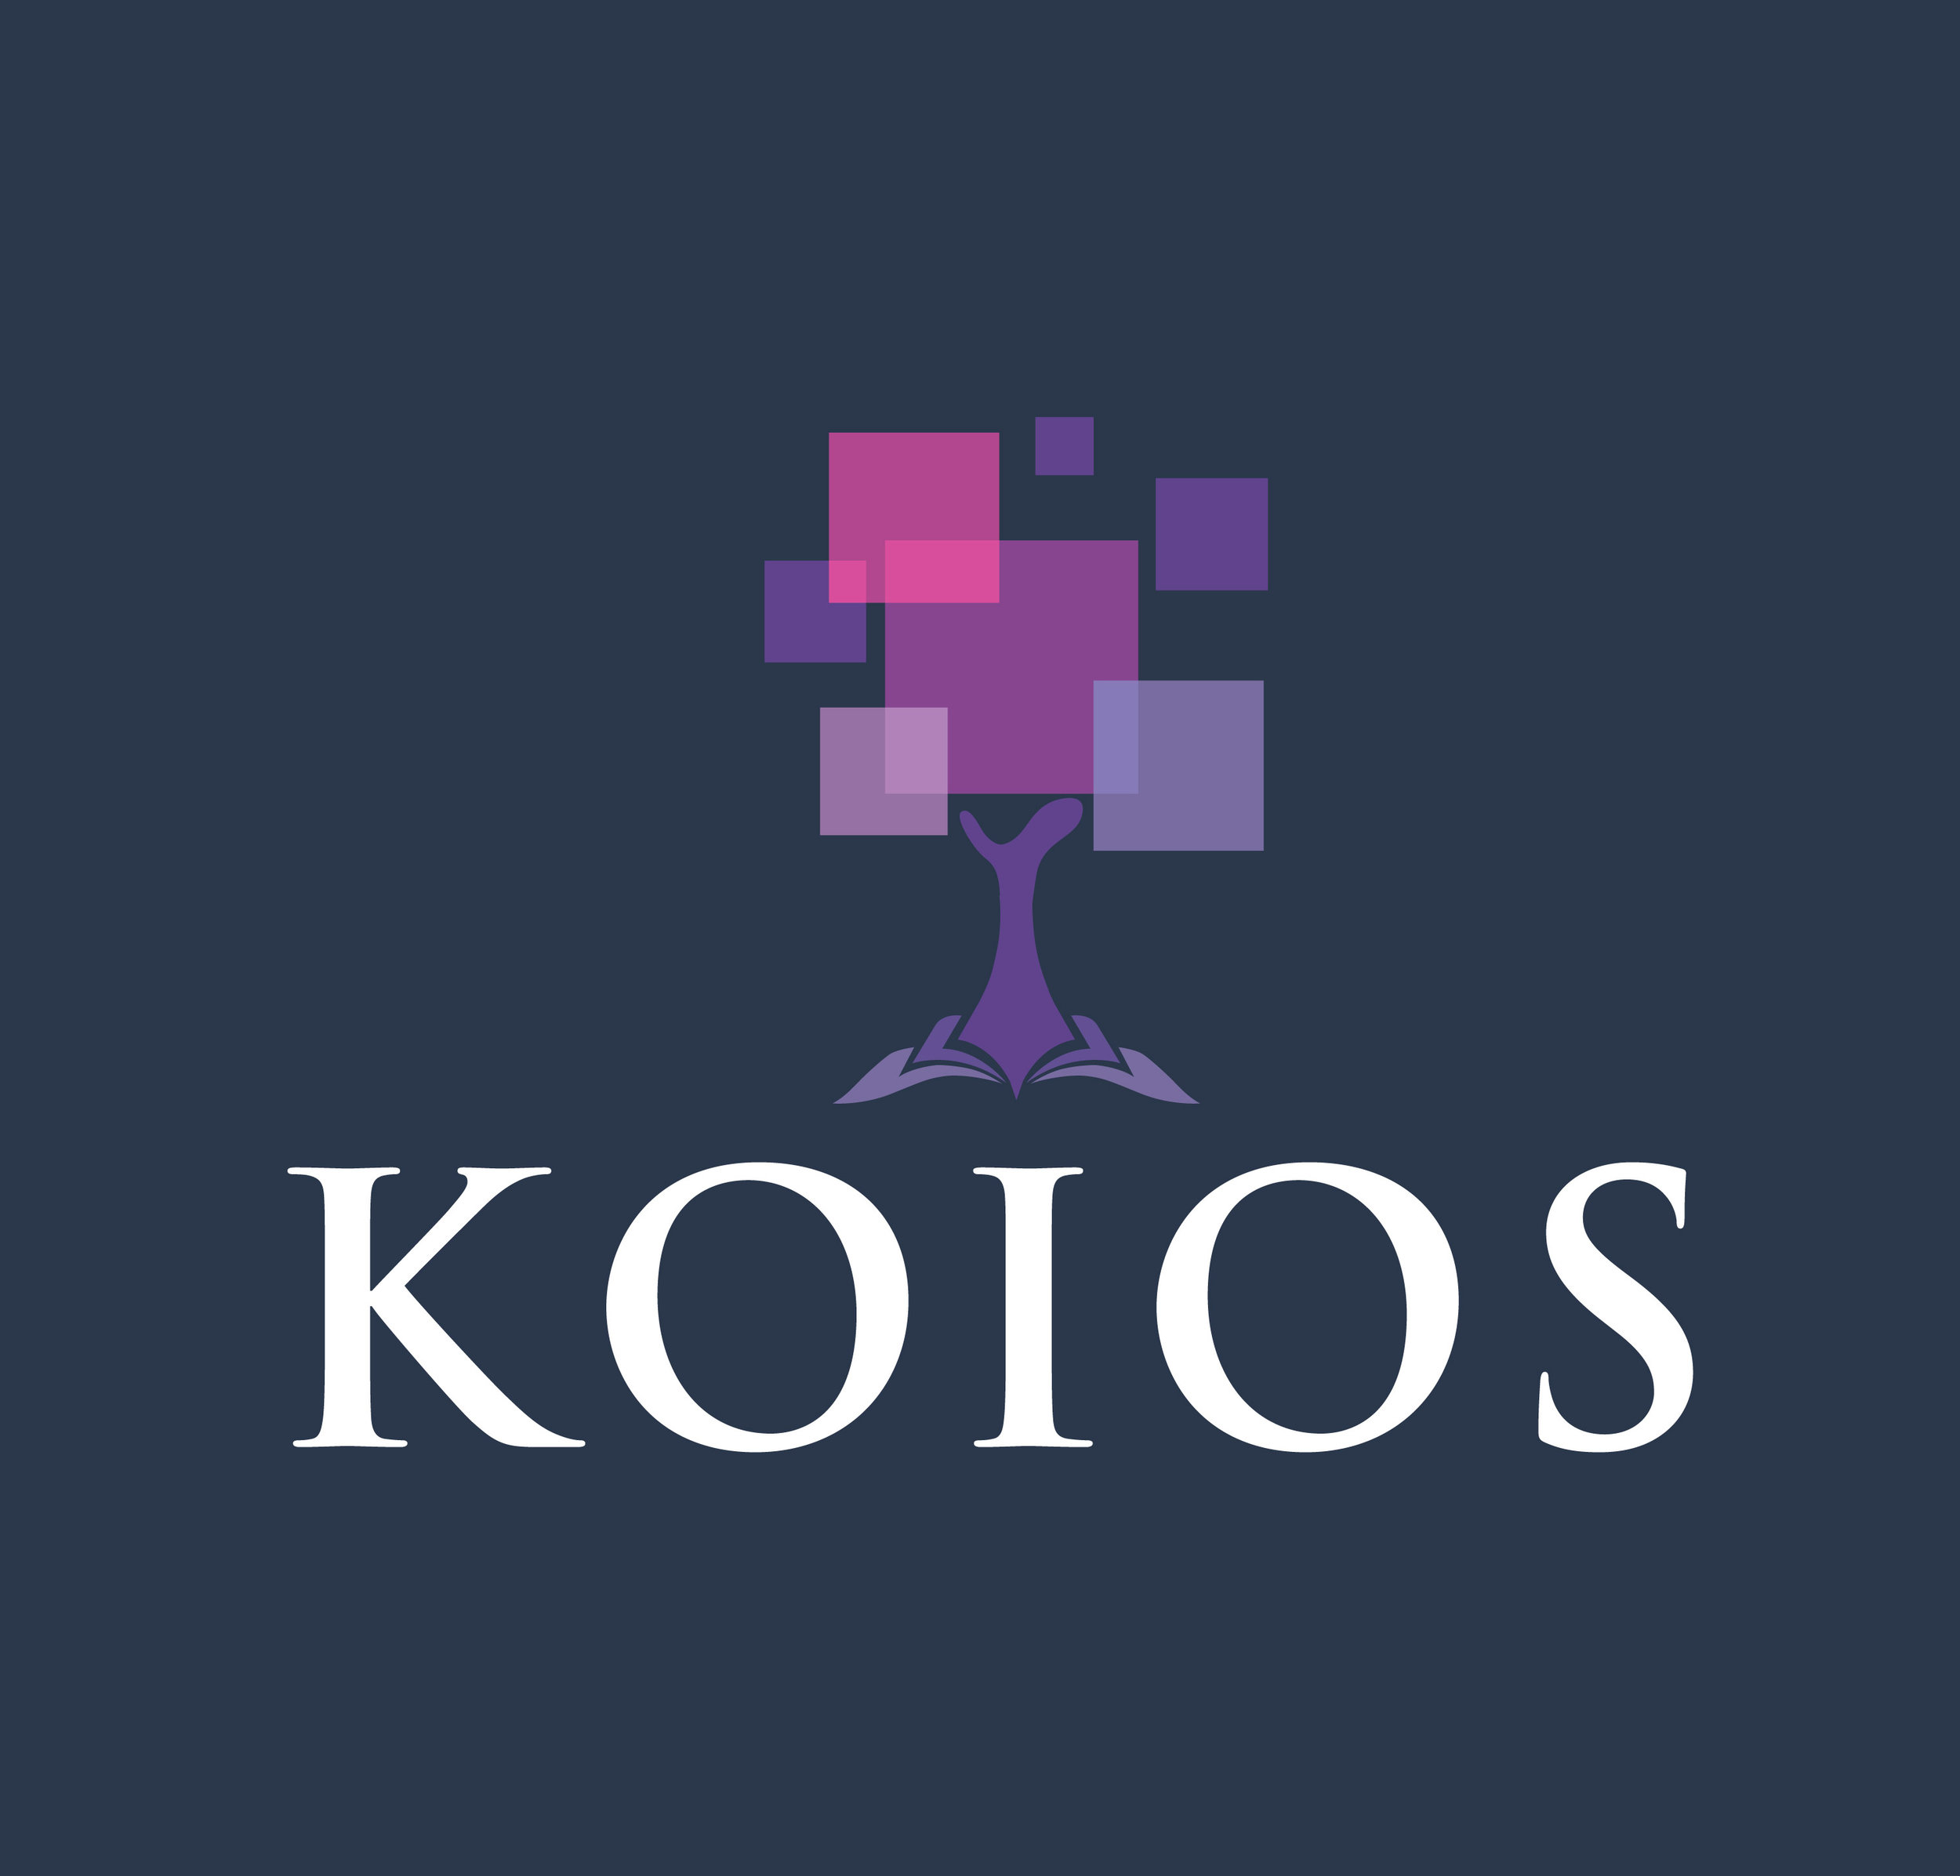 Official Koios logo (.jpg, dark background)